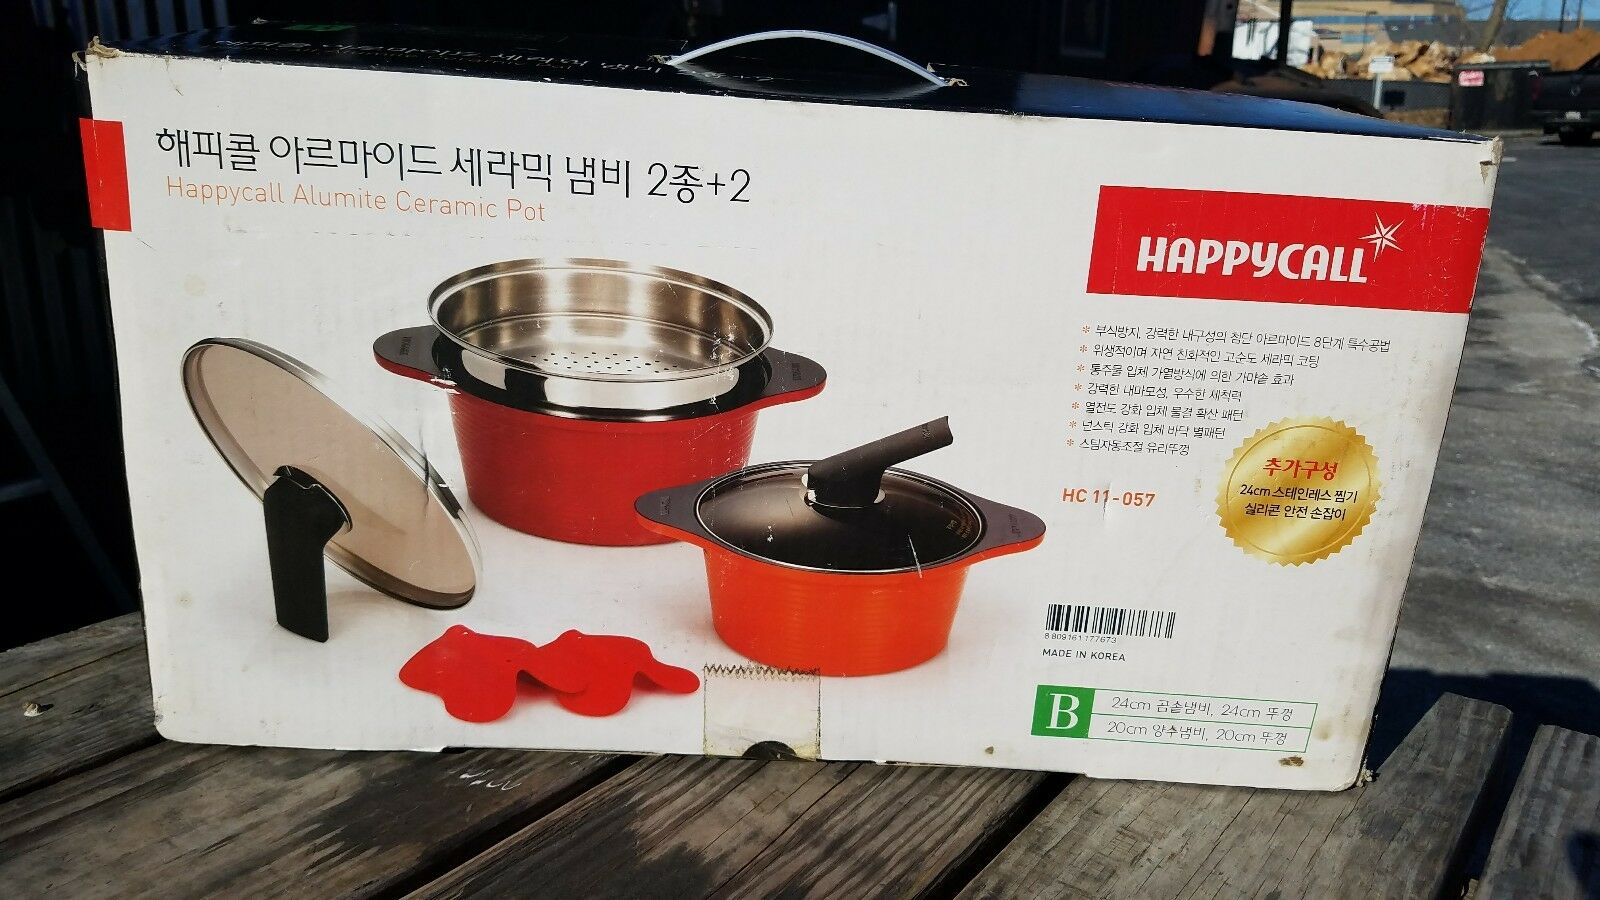 Happycall Alumite Ceramic Two Handle Pot 7pc cook set.